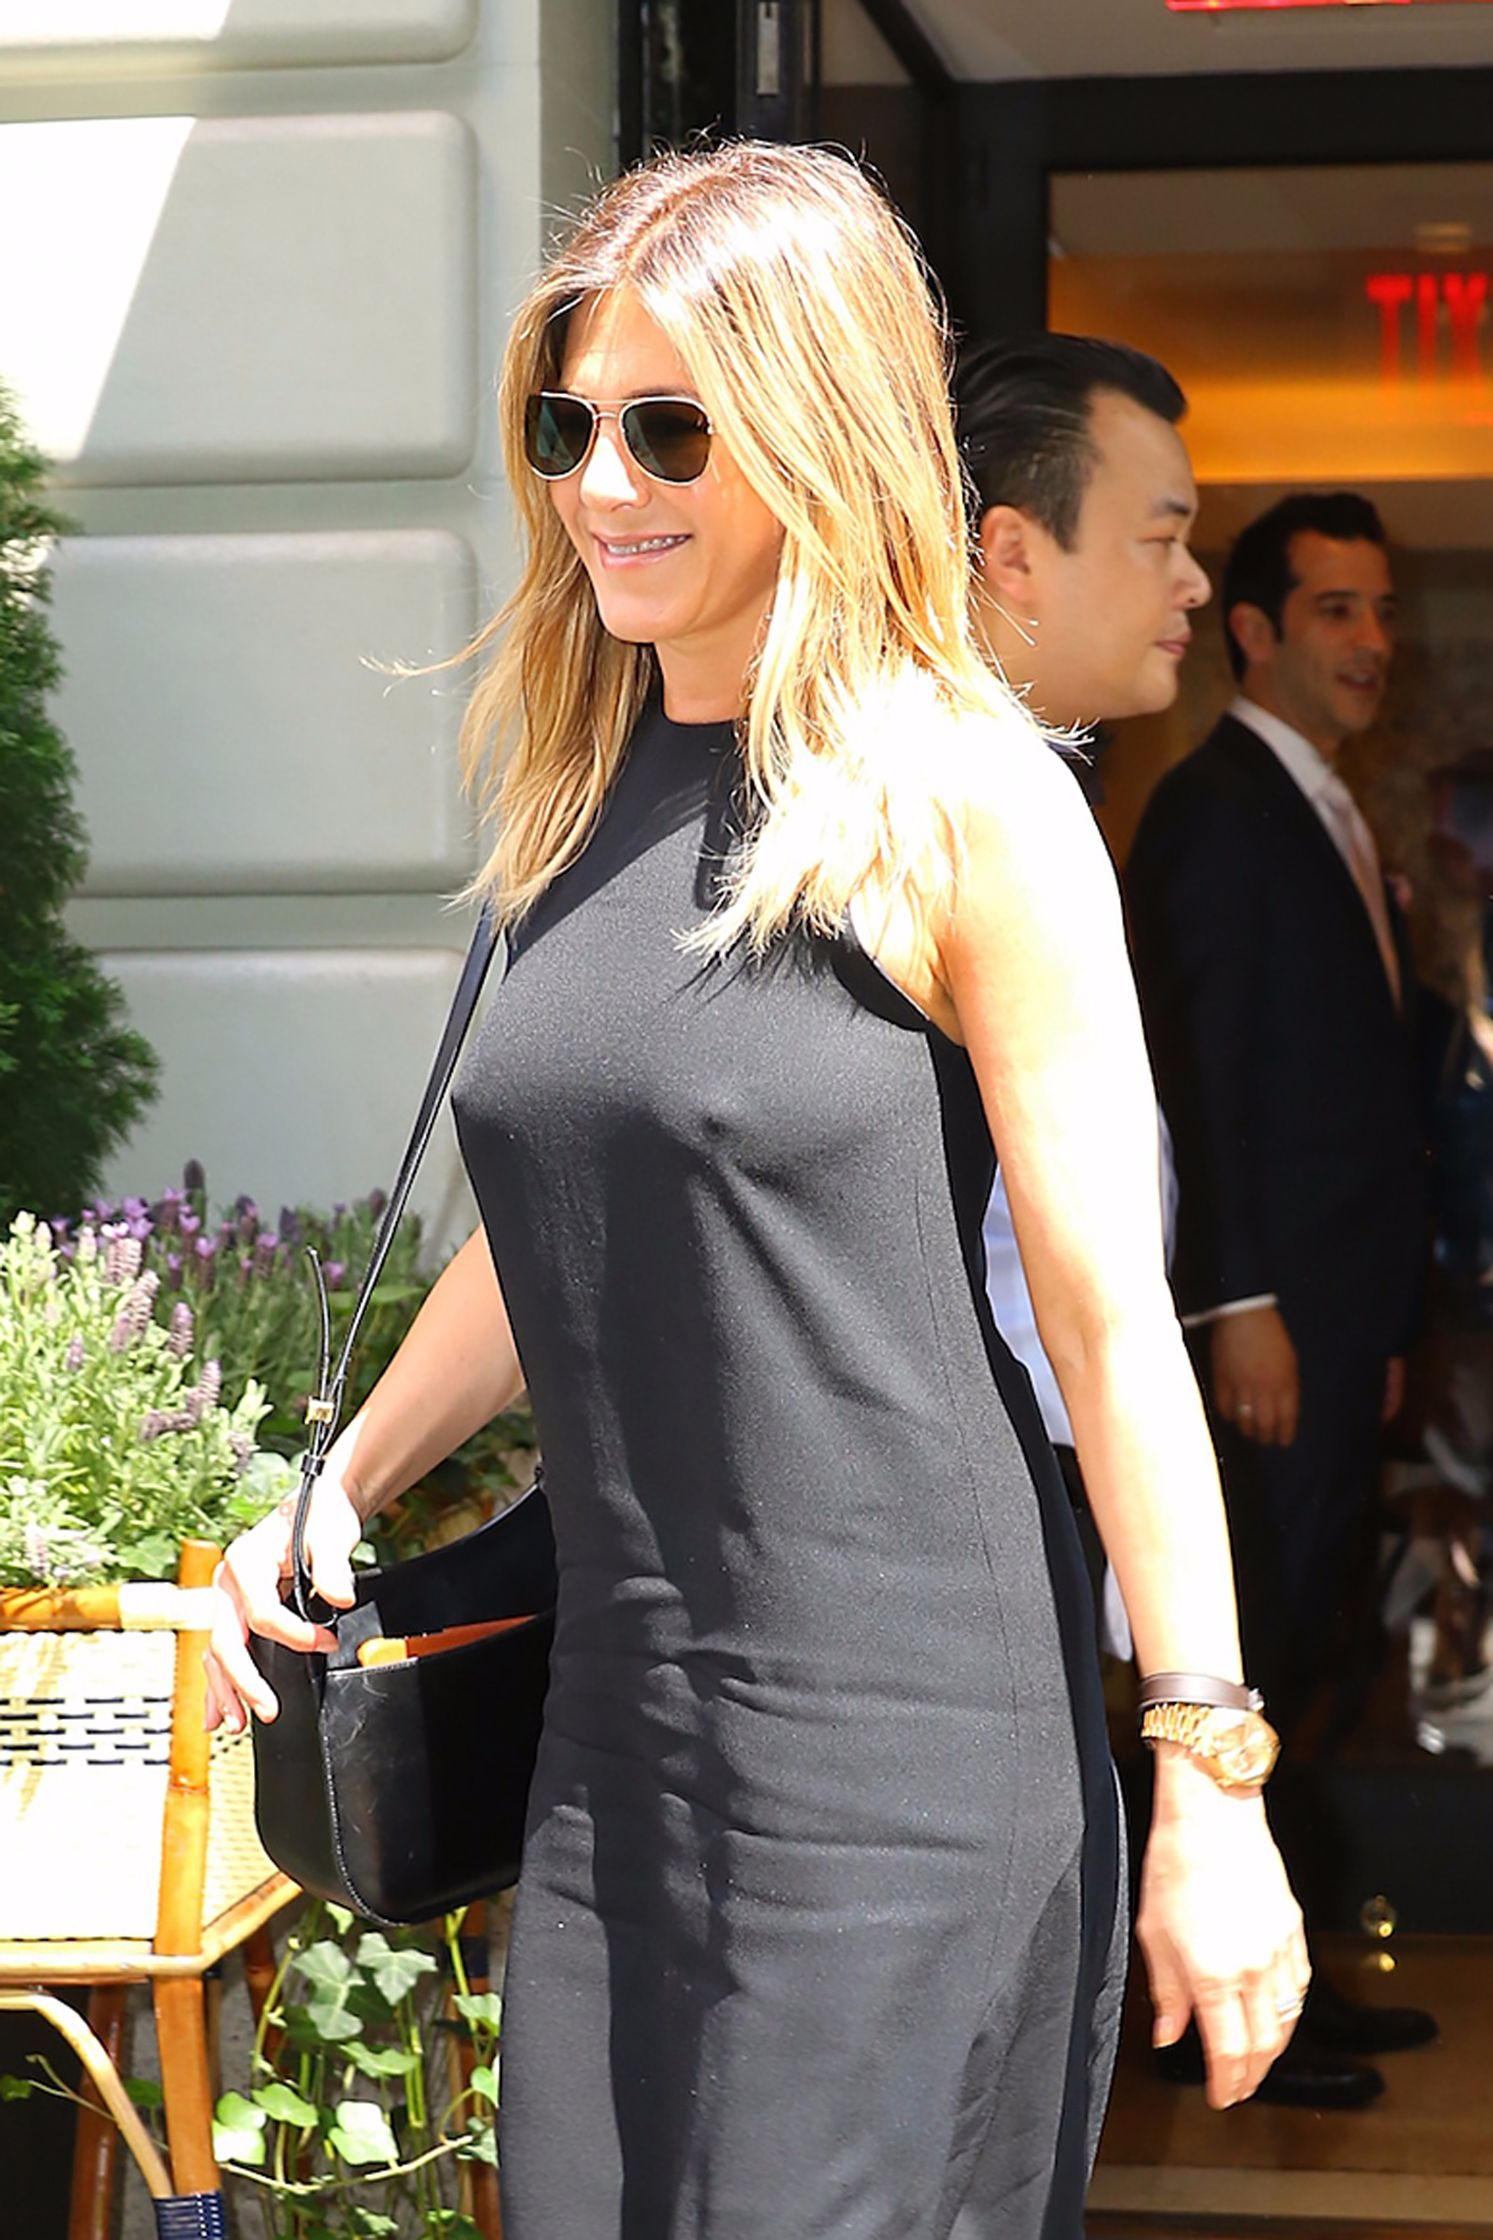 jennifer-aniston-braless-pokies-in-new-york-14 | celebrity-slips.com